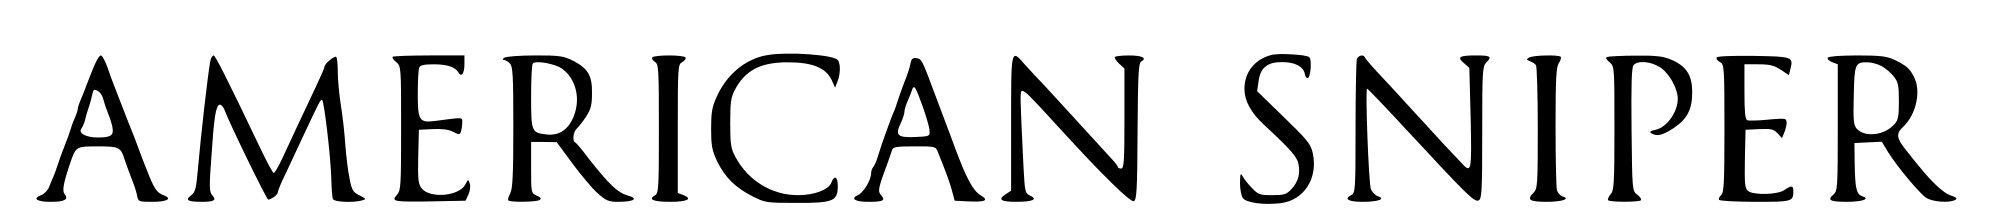 American Sniper (2014 film)